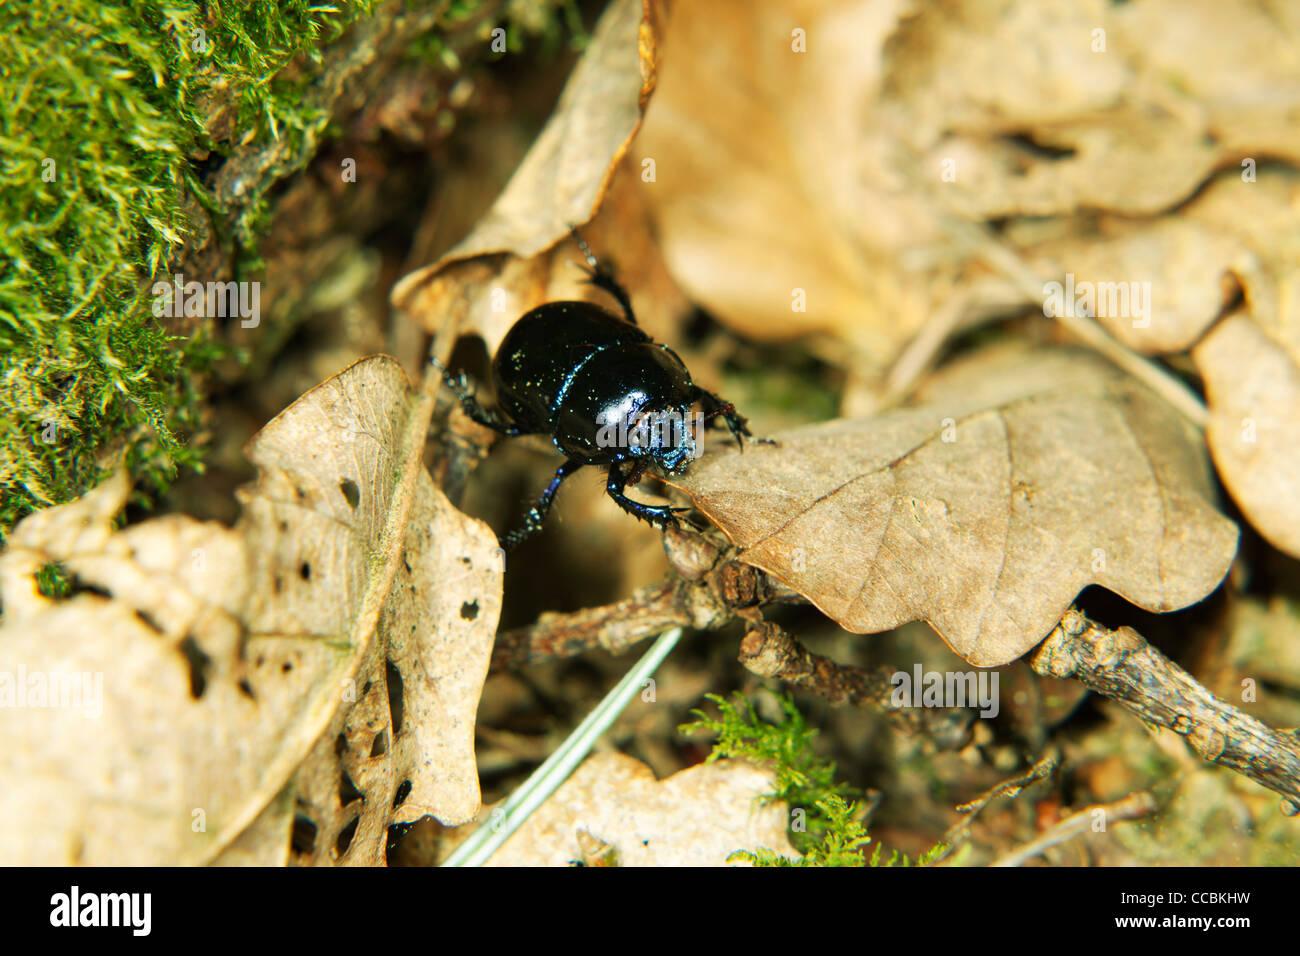 Black beetle - Stock Image